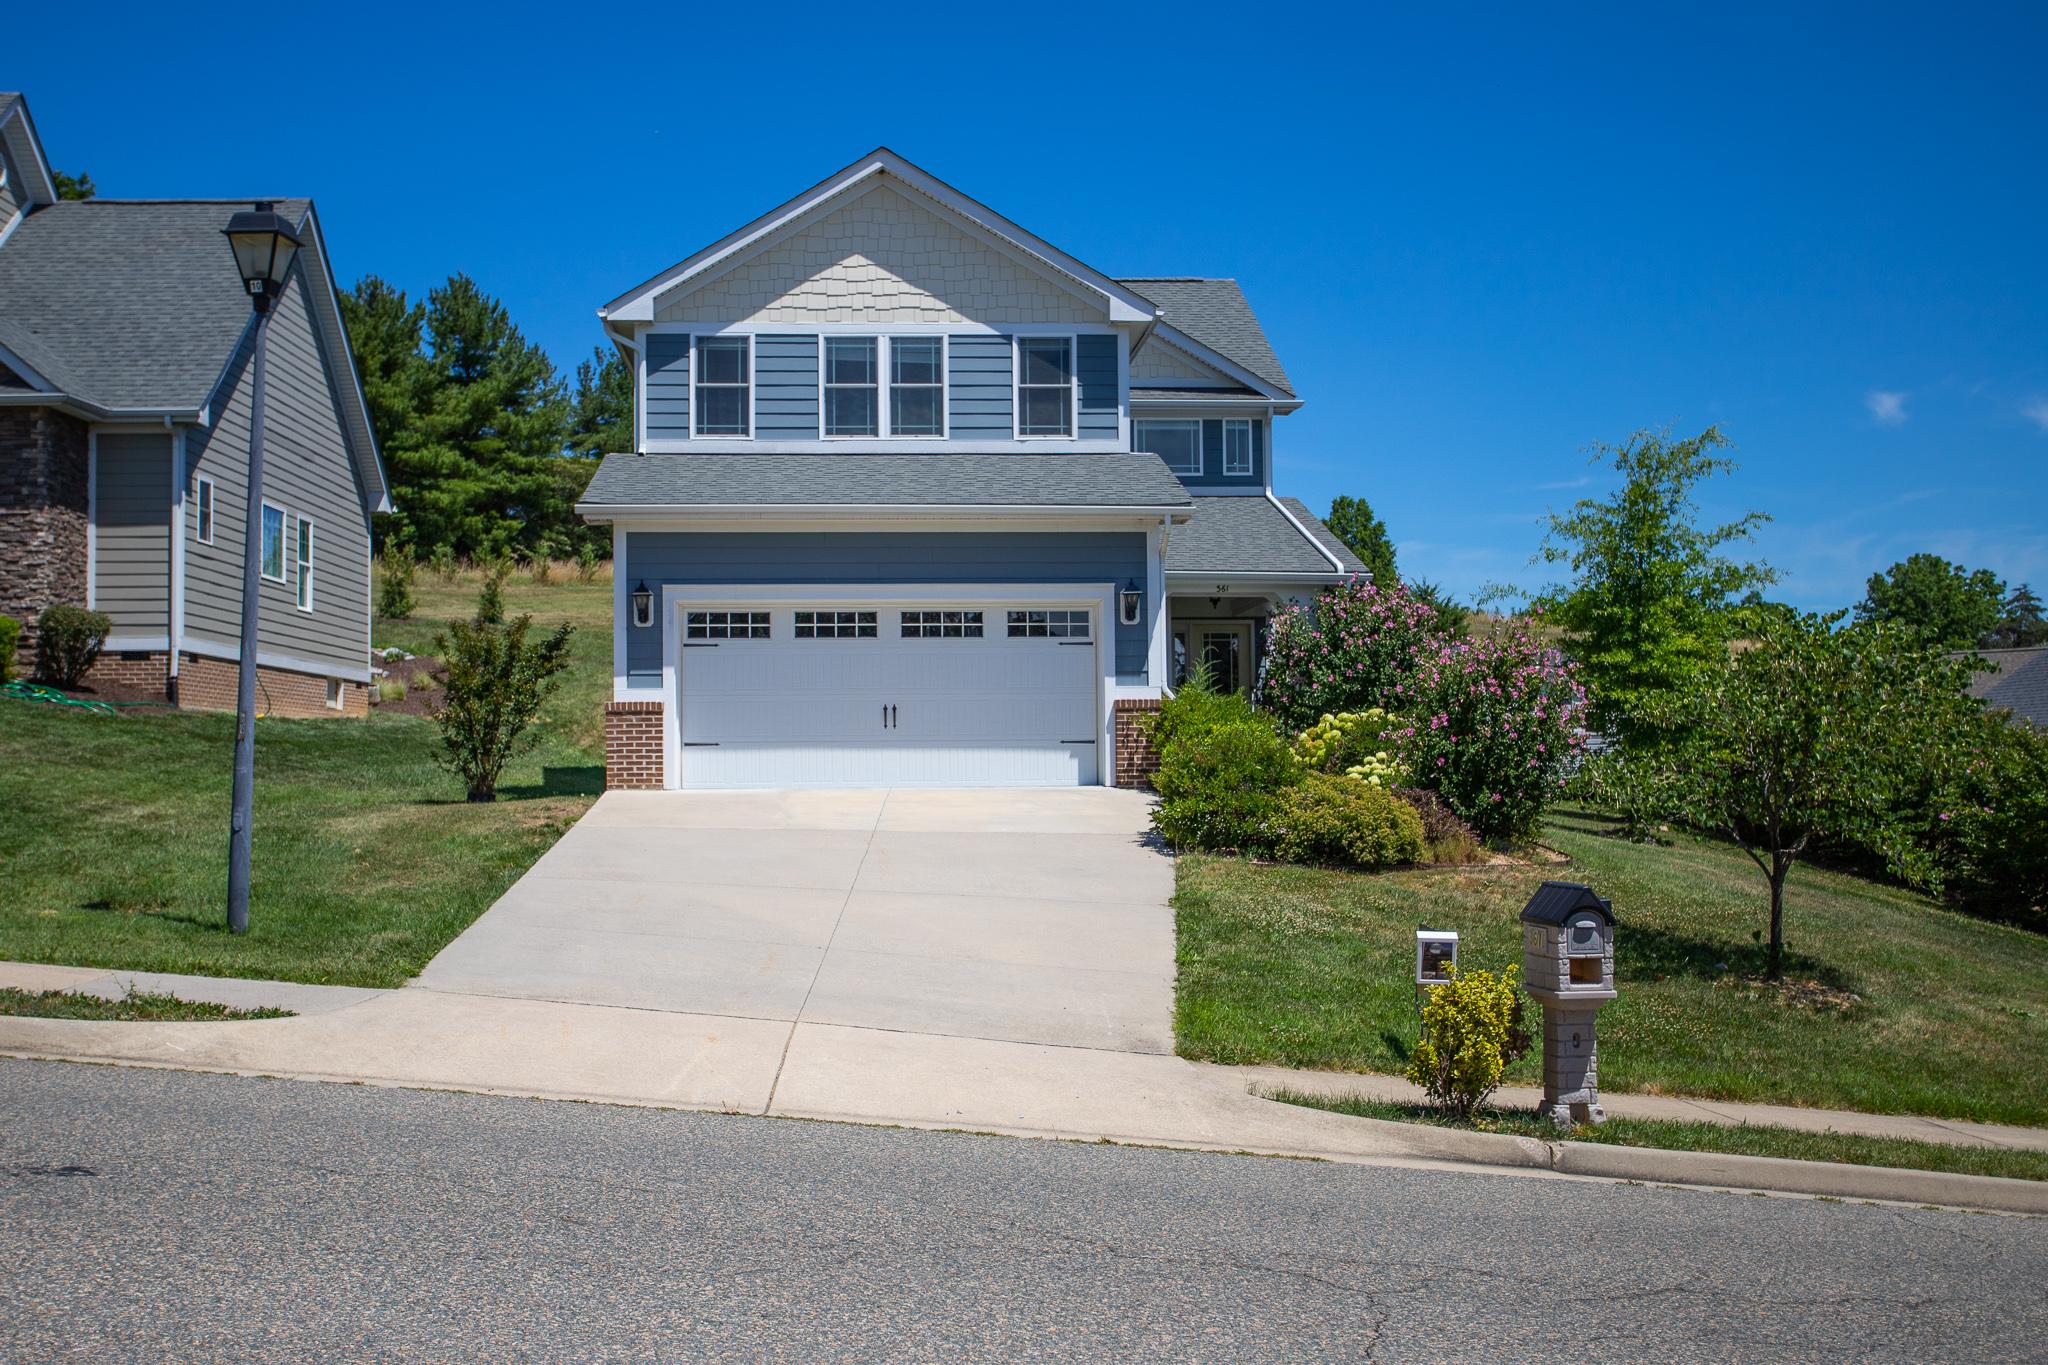 Home for Sale in Fishersville, 361 Windsor Dr